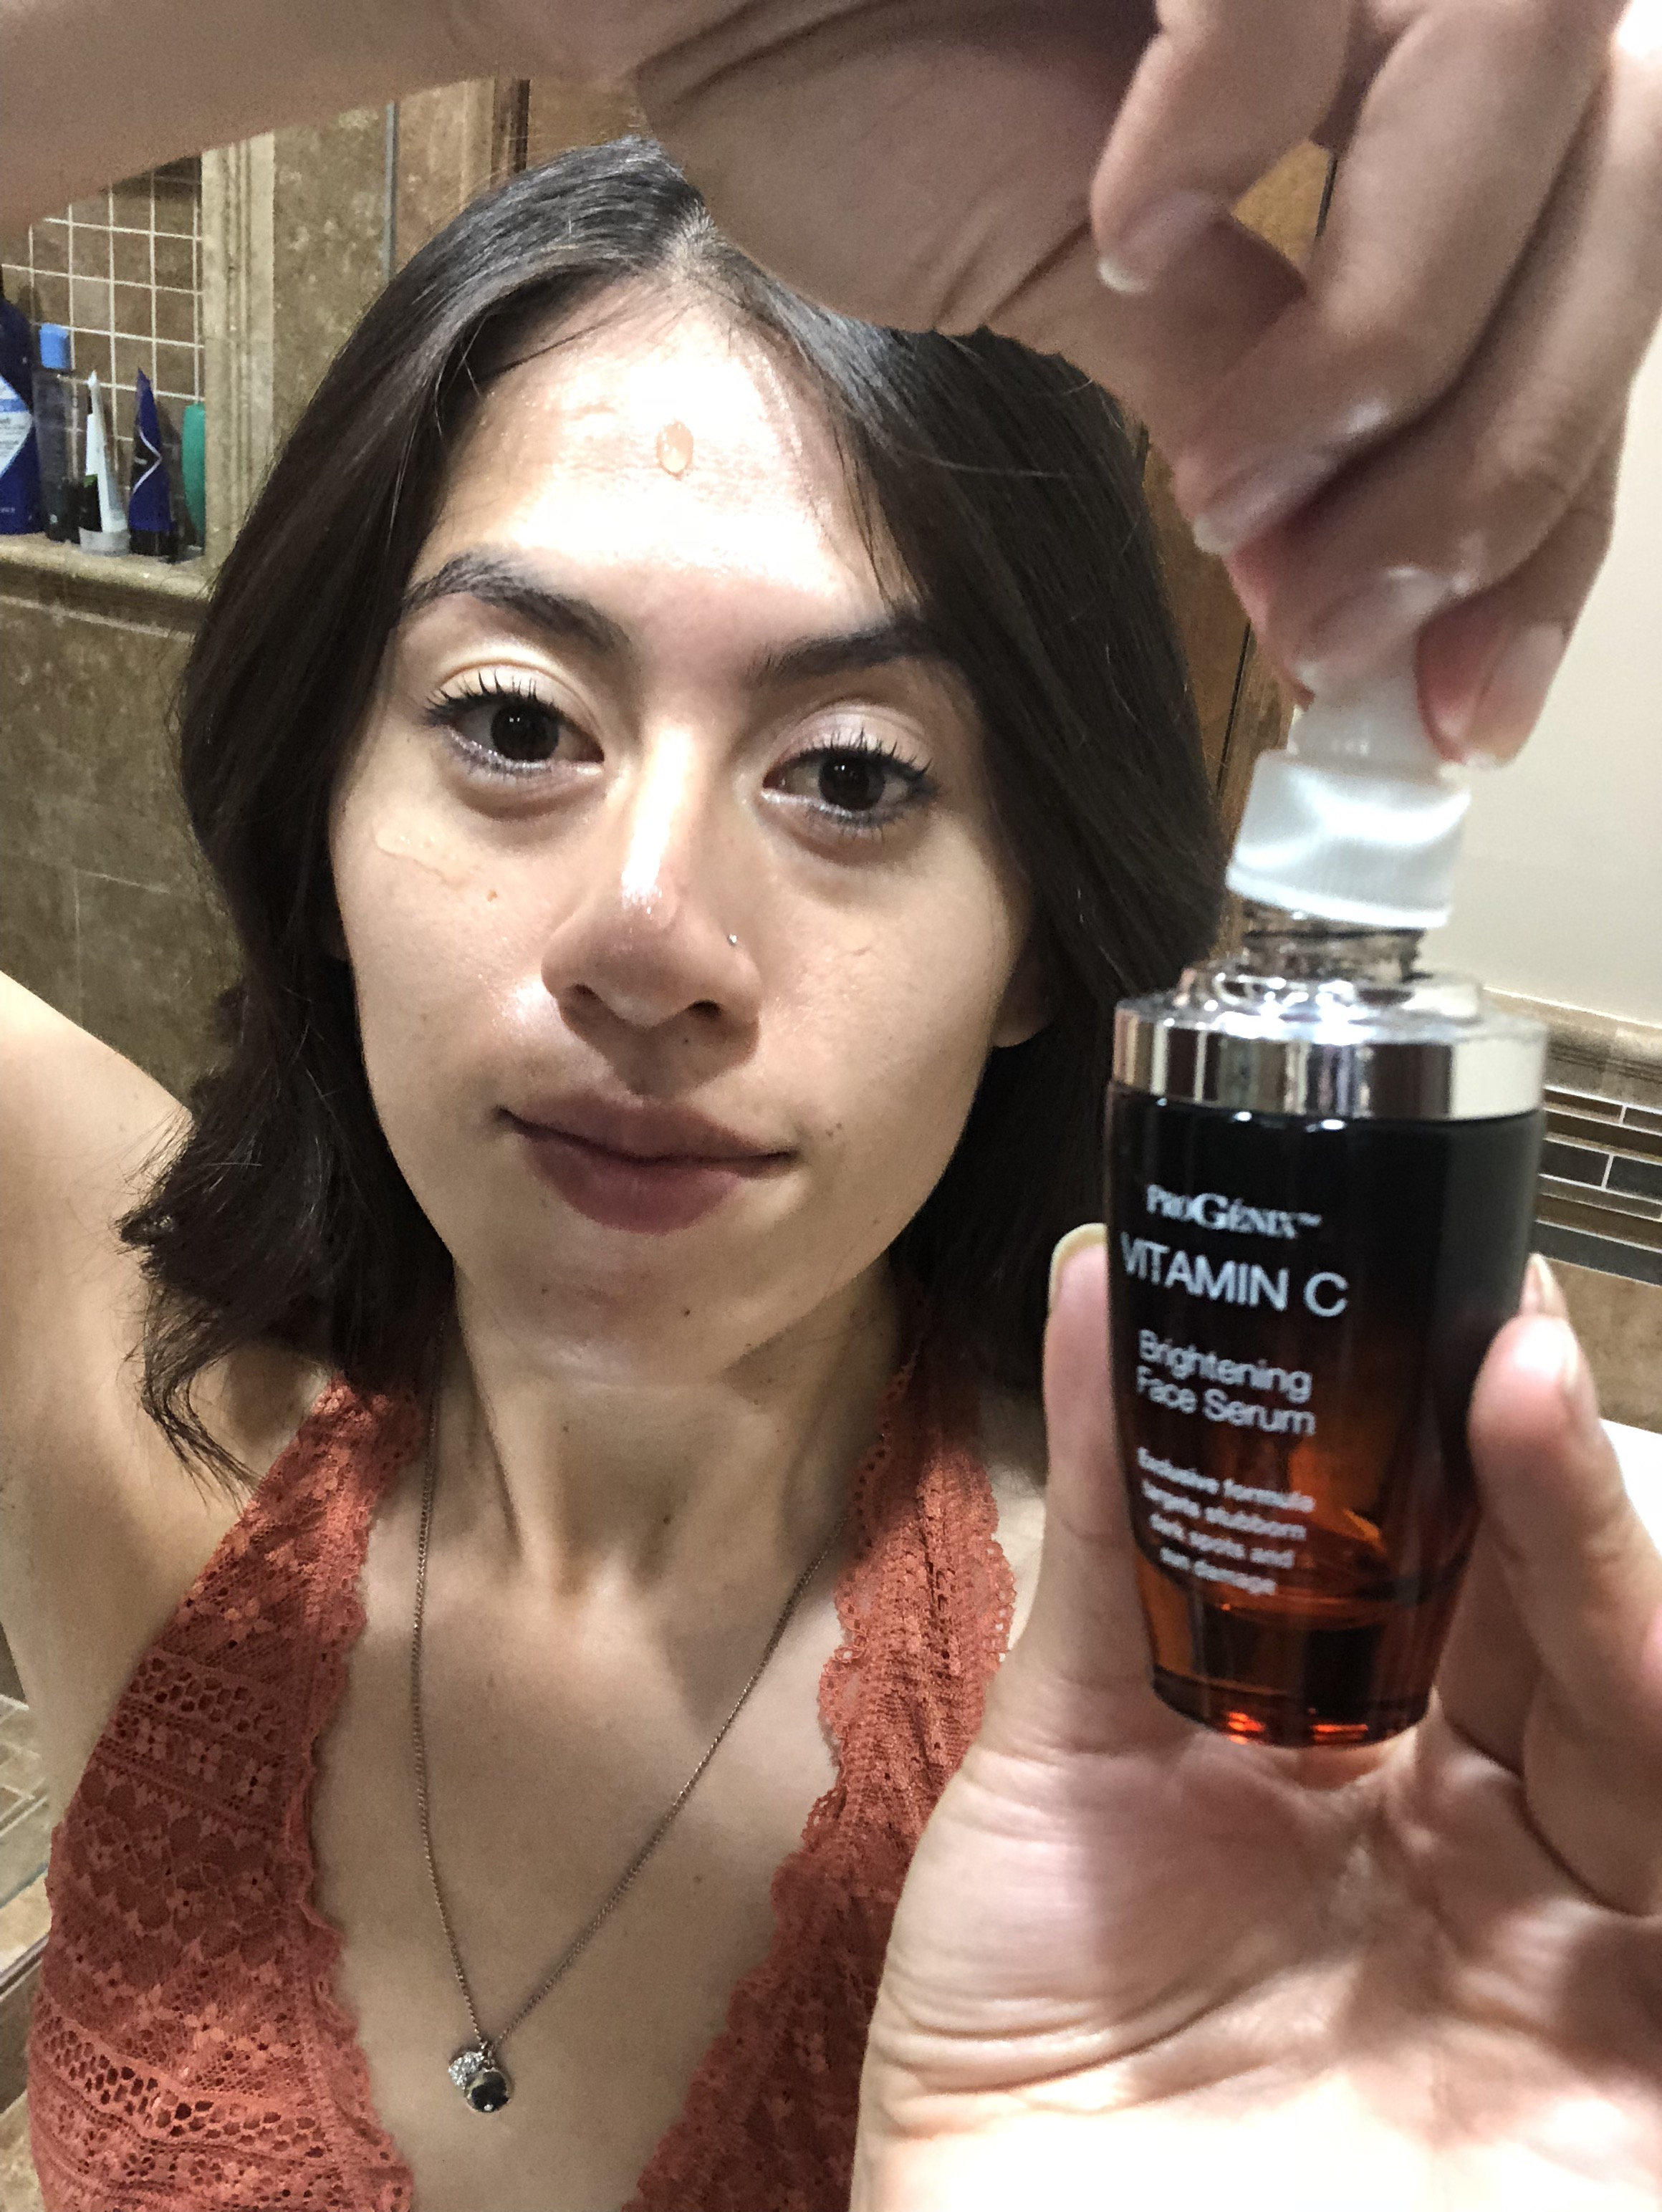 Progenix Vitamin C face Serum